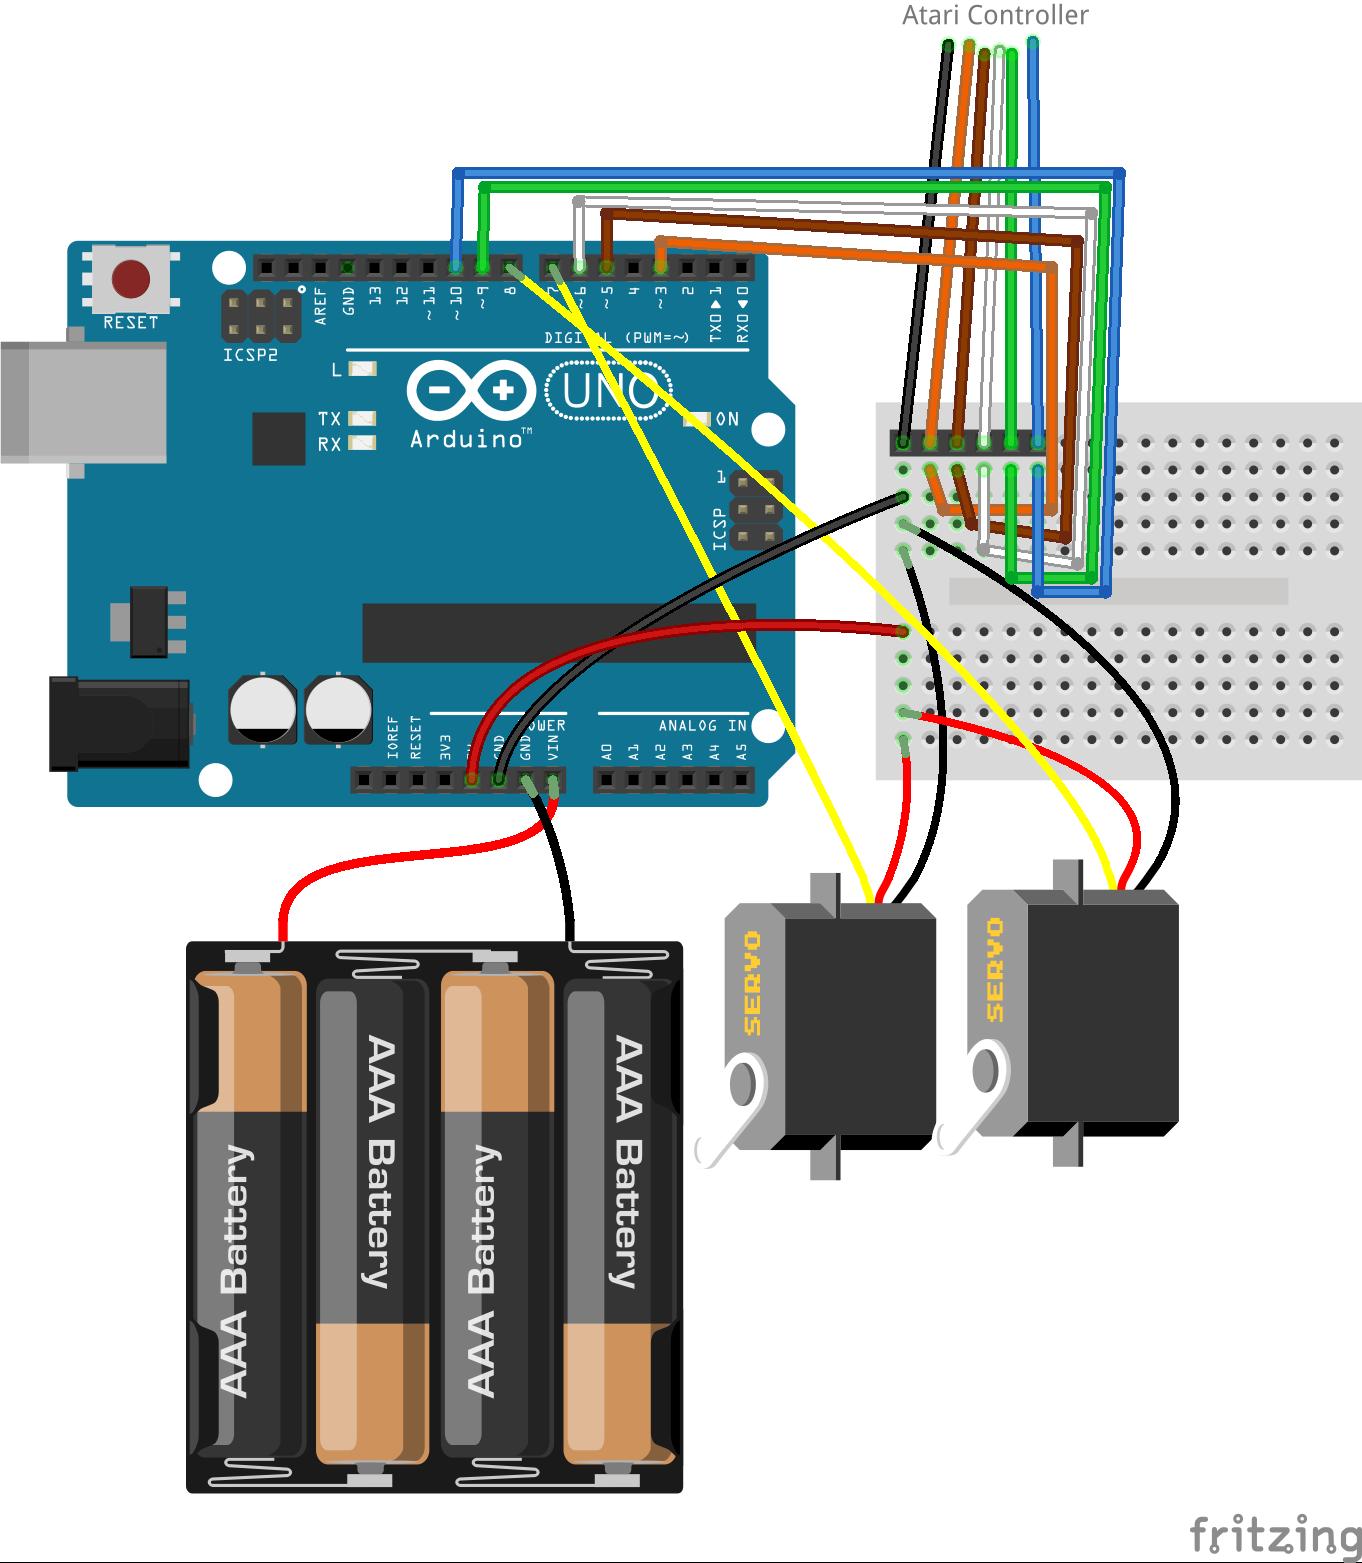 atari uzlfdxyl9r arduino pinterest arduino rh pinterest com Raspberry Pi Zero Transmitter Raspberry Pi Zero Transmitter